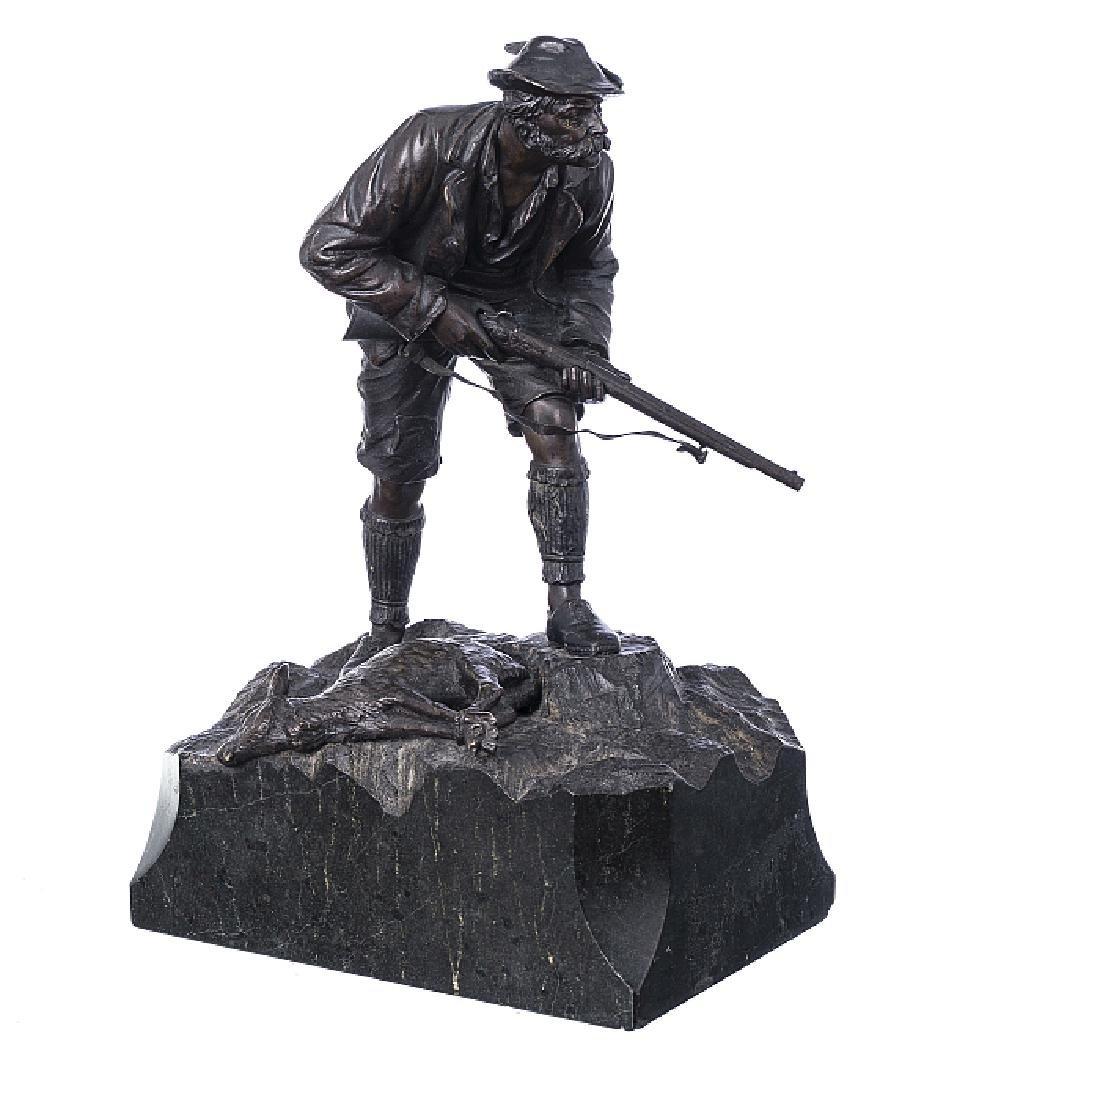 Hunter in bronze